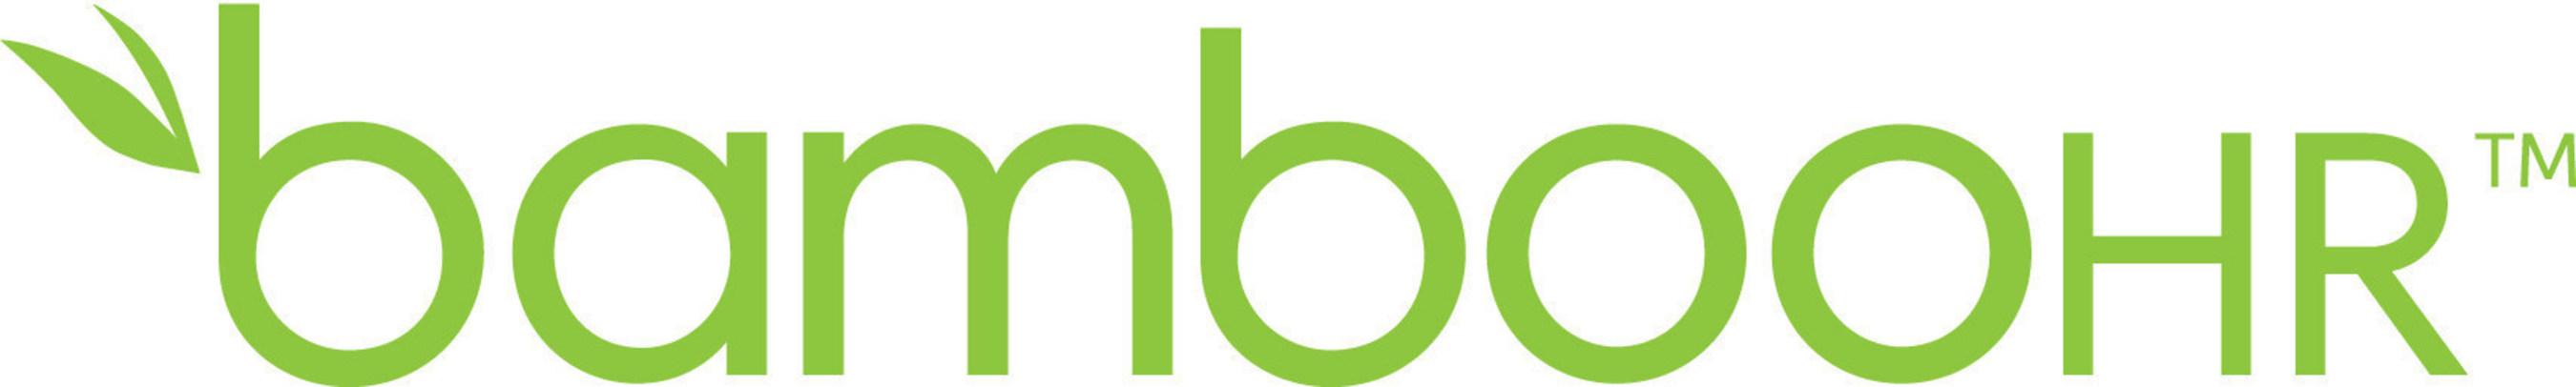 BambooHR Named One Of The 'Best Entrepreneurial Companies In America' By Entrepreneur Magazine's 2016 Entrepreneur 360 List